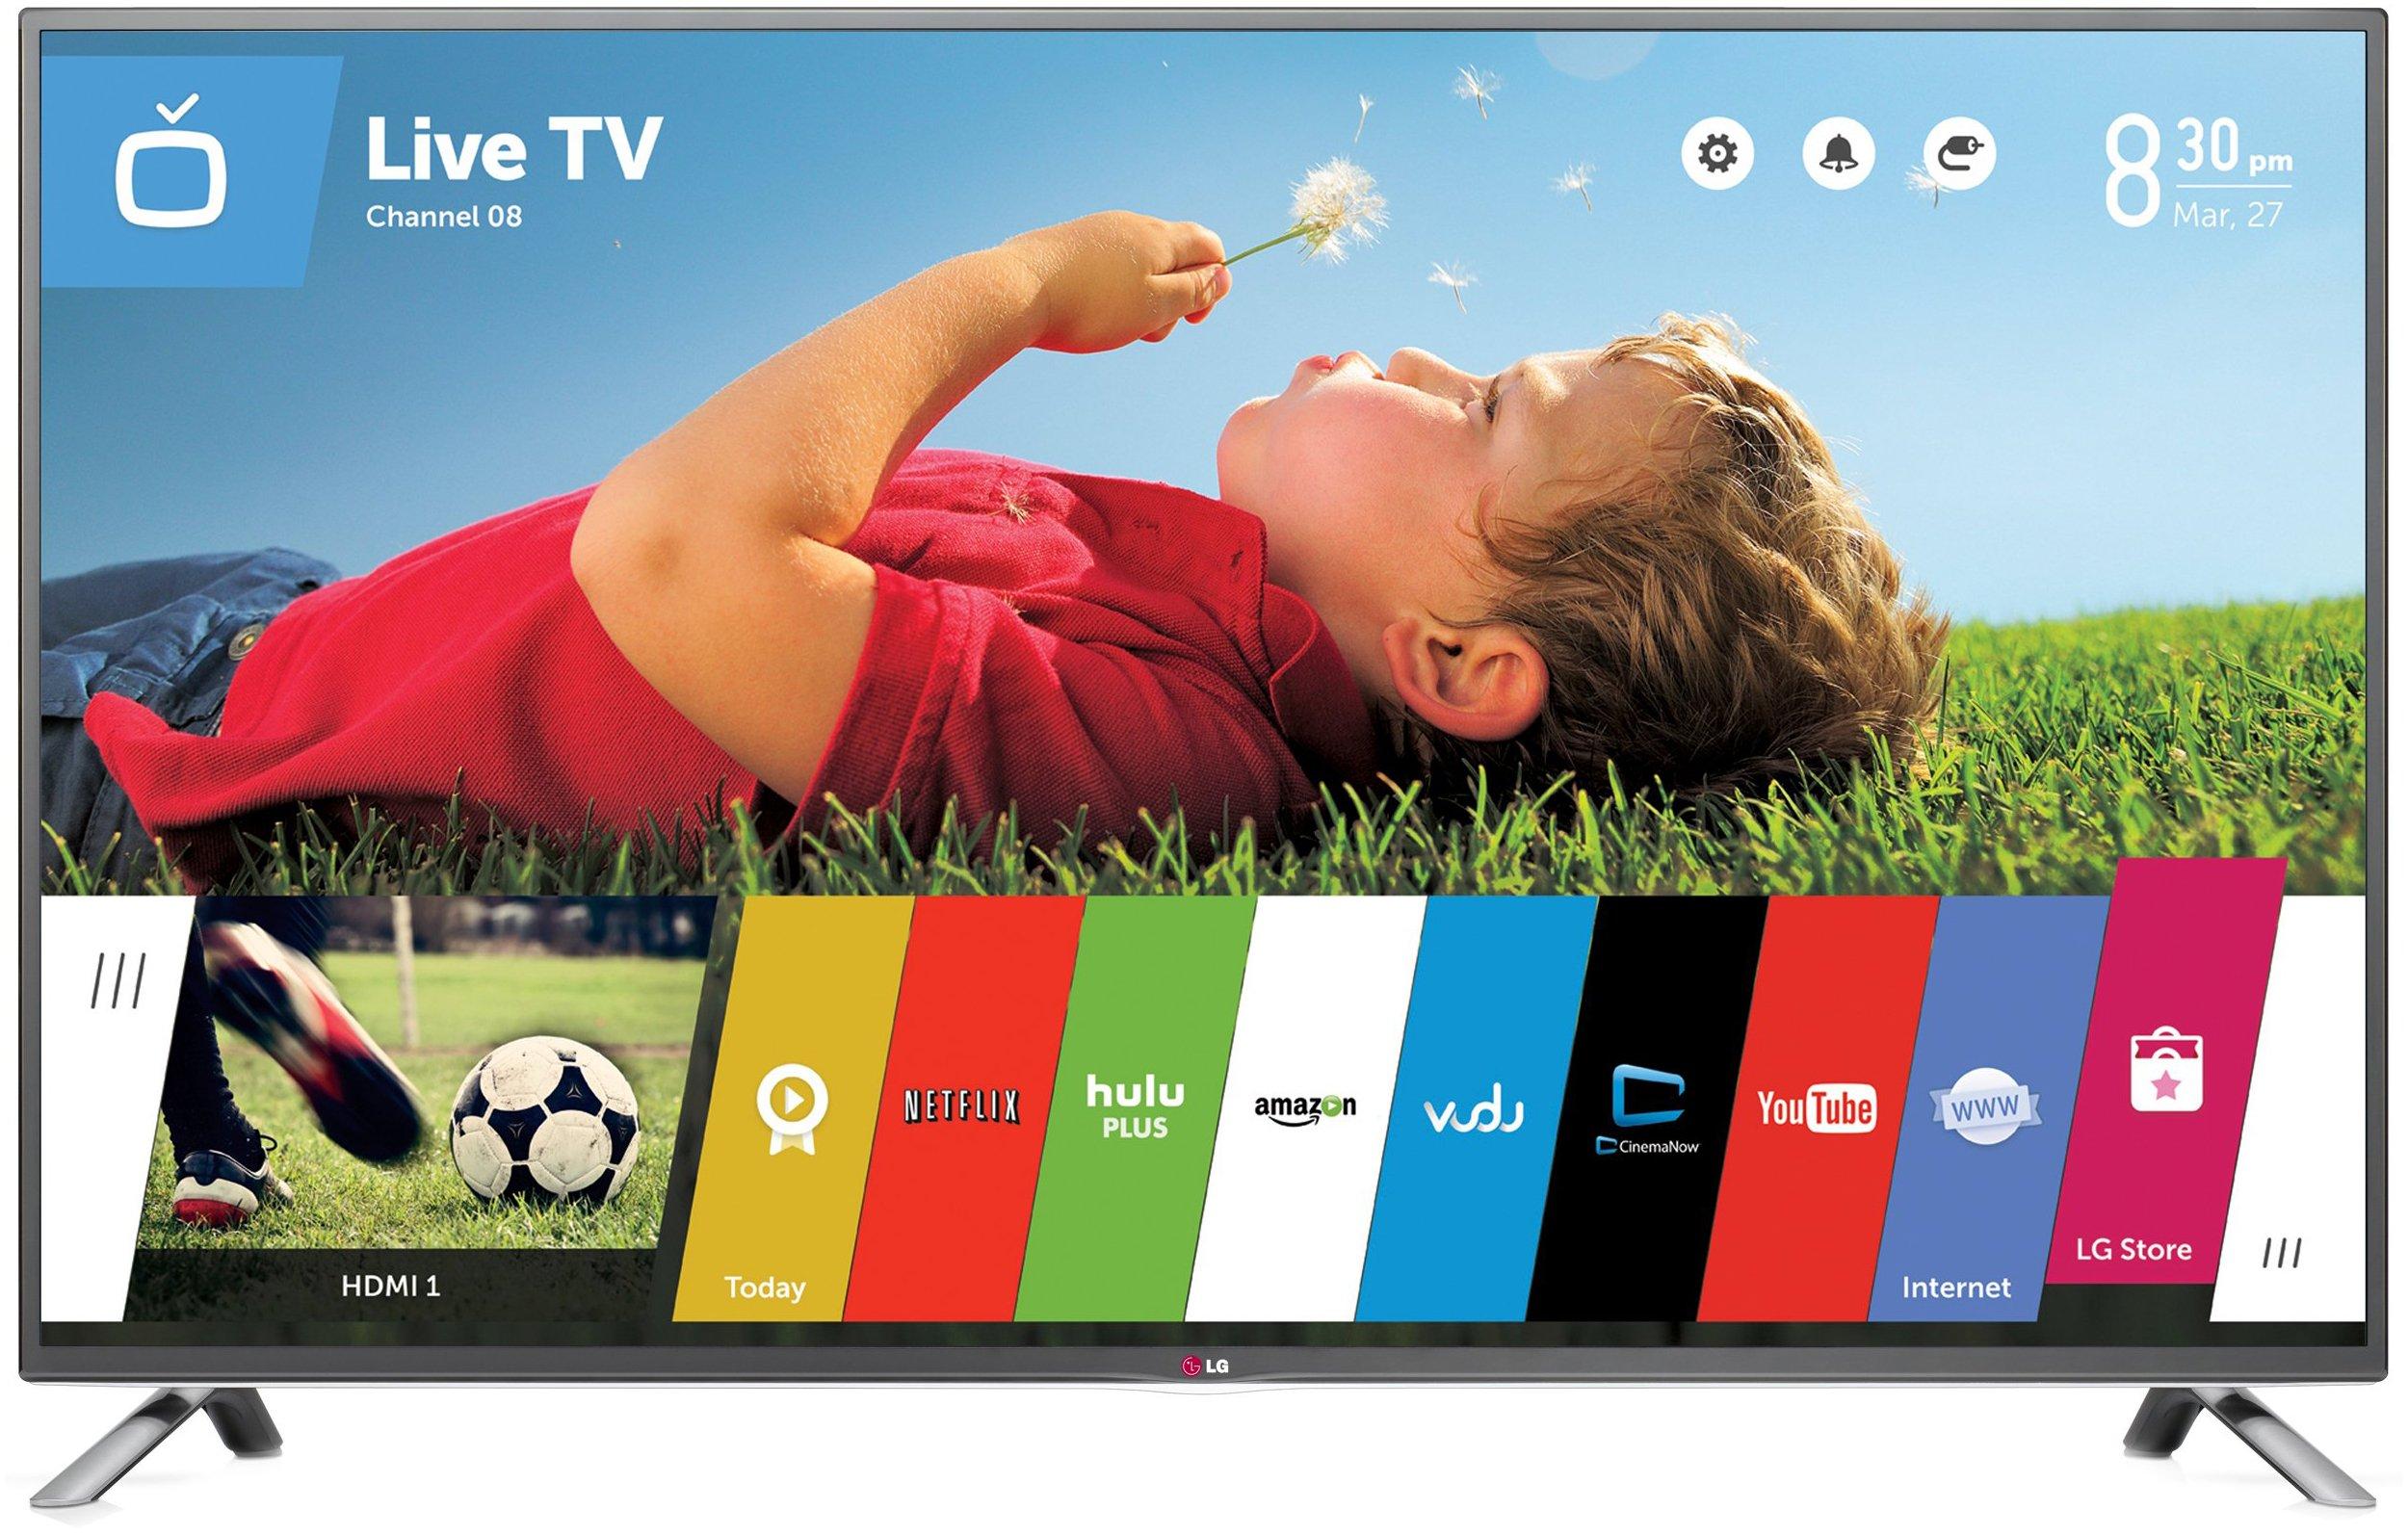 f8f6fe4d1 Get Quotations · LG Electronics 60LB6300 60-Inch 1080p 120Hz Smart LED TV (2014  Model)